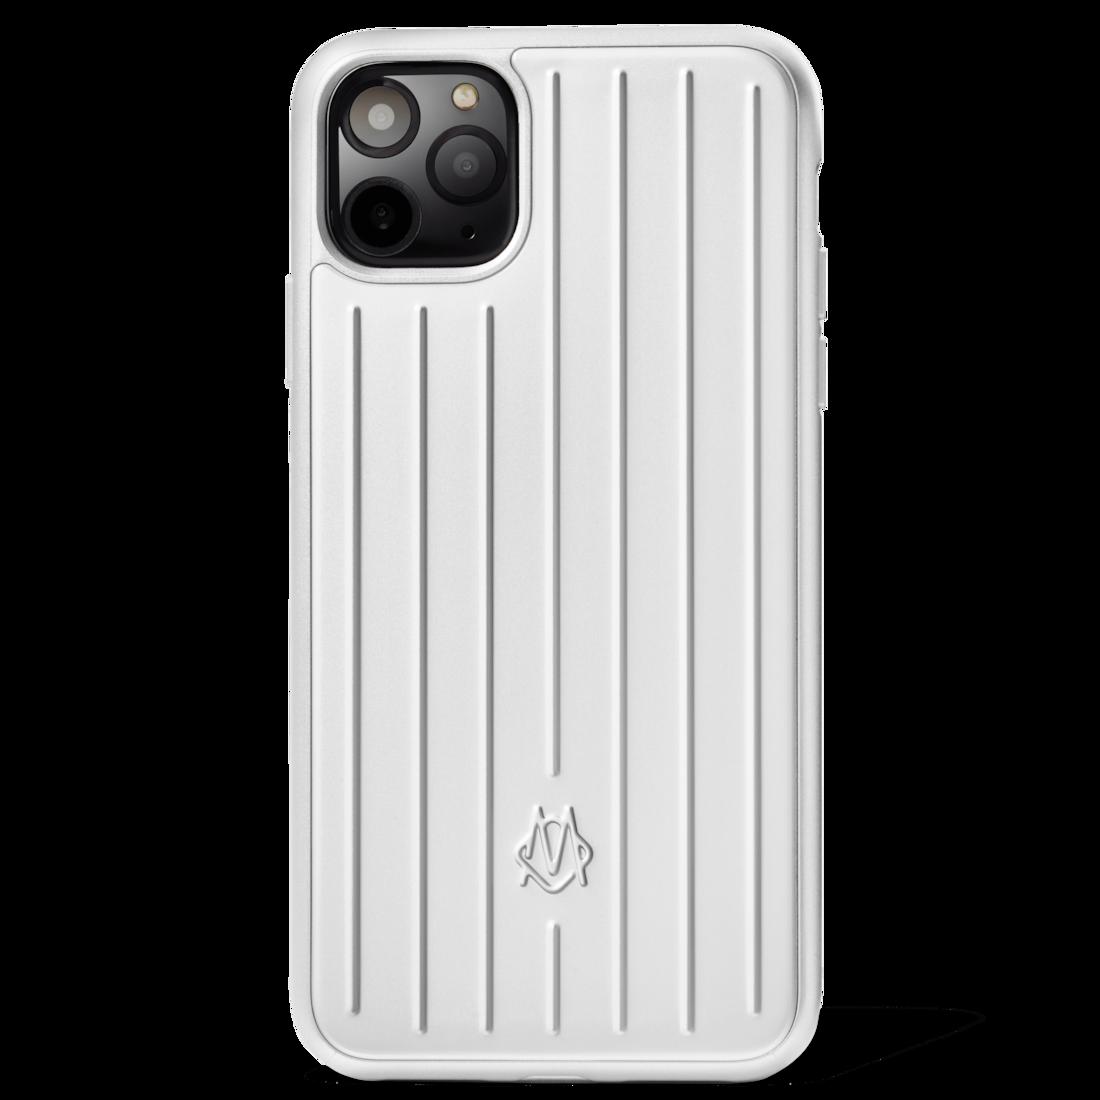 Aluminium Iphone 11 Pro Max Case Silver Rimowa